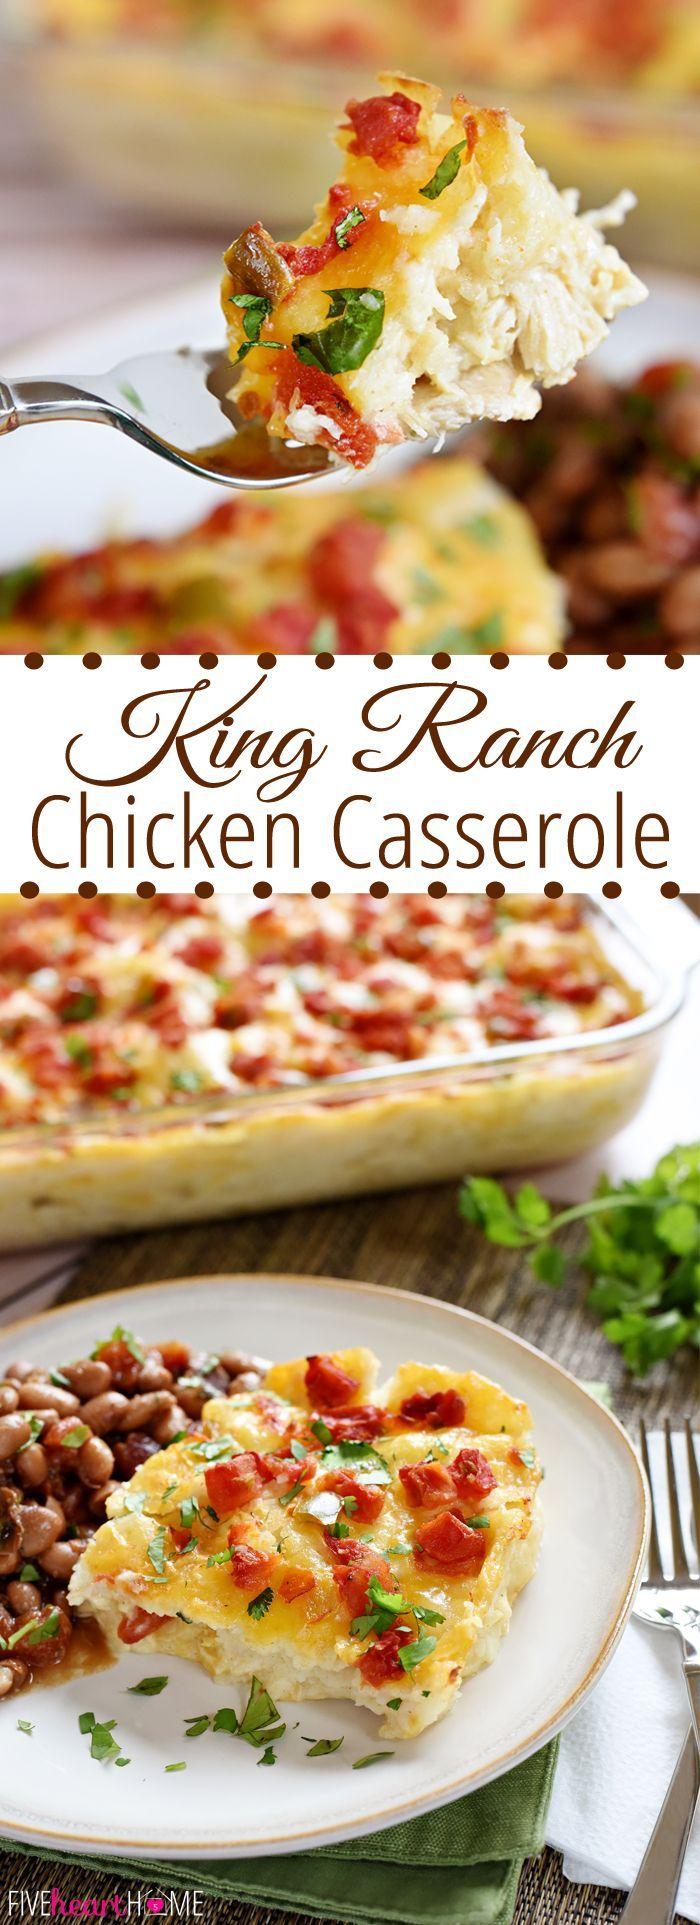 King Ranch Chicken Casserole FoodBlogs.com